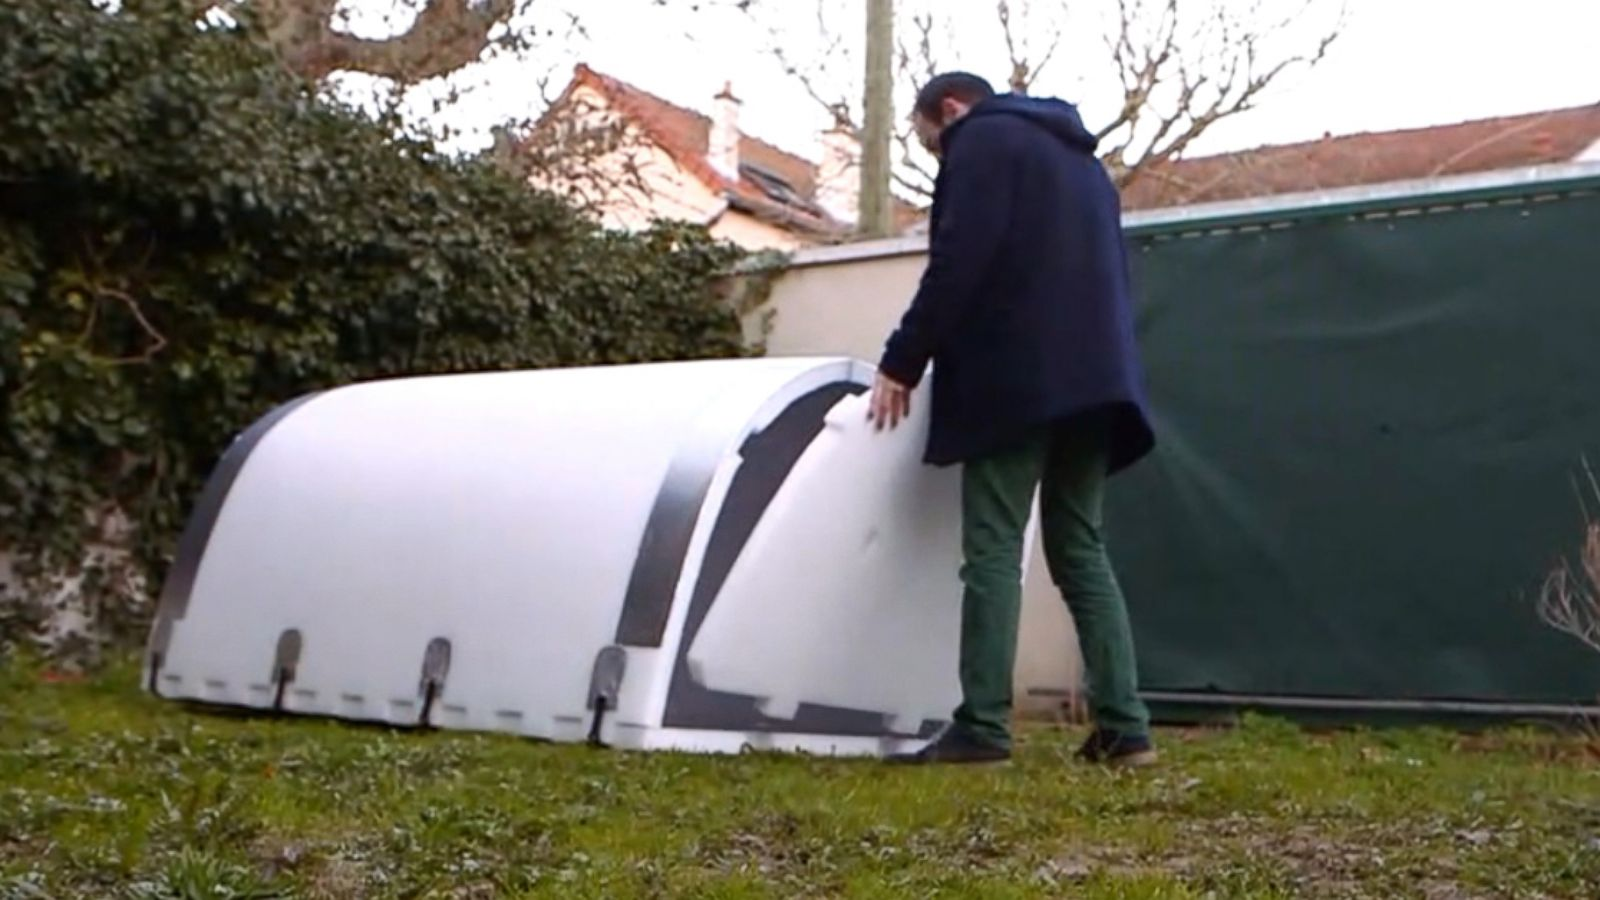 Igloos provide shelter for homeless population in France